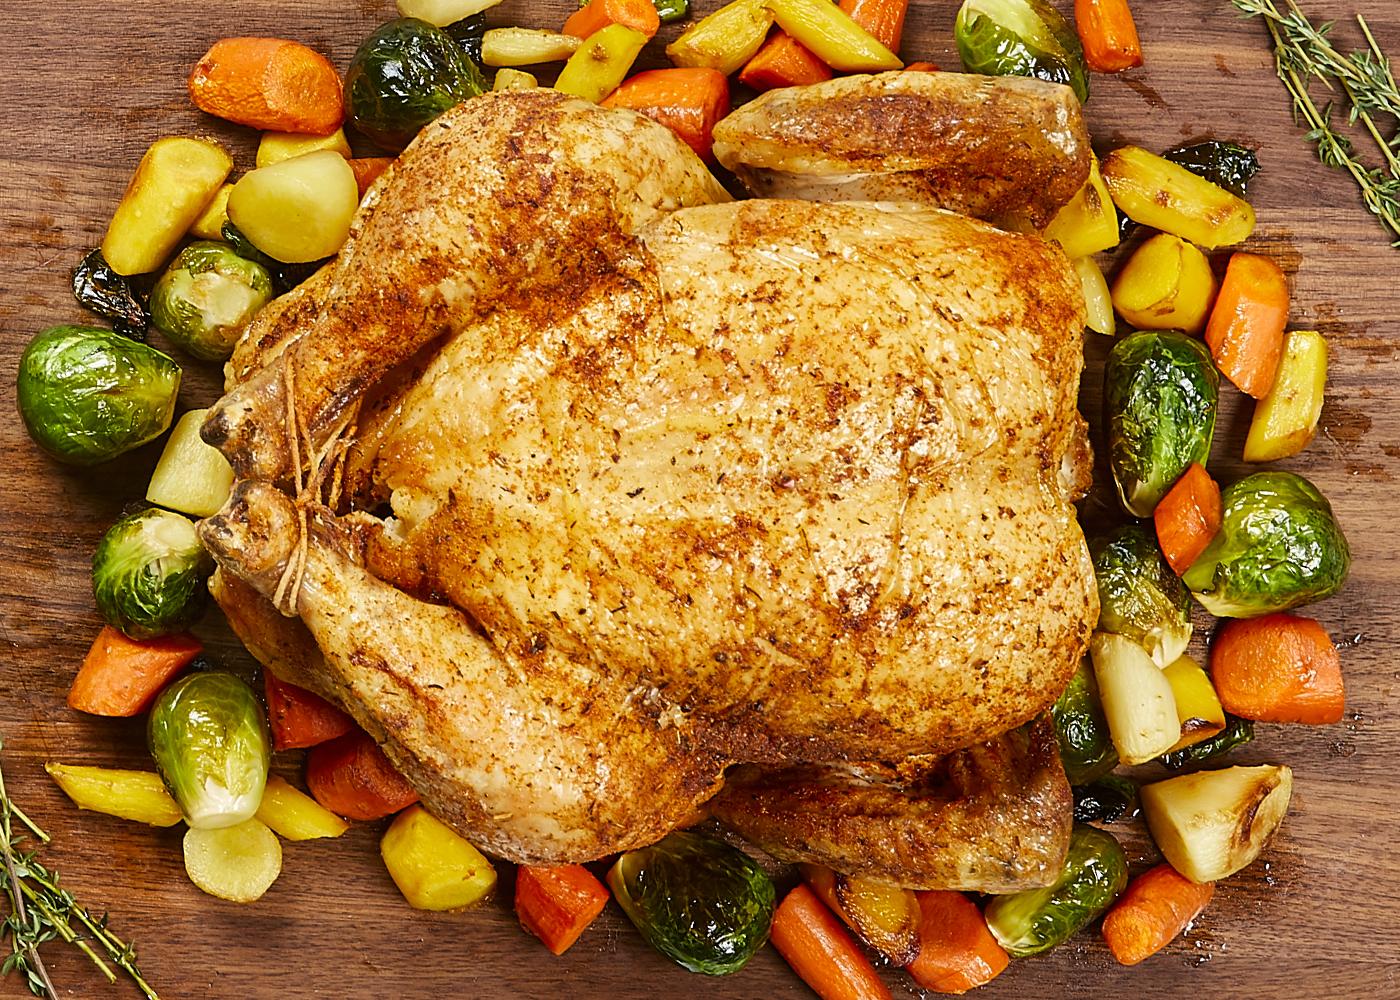 Juicy Roast Chicken